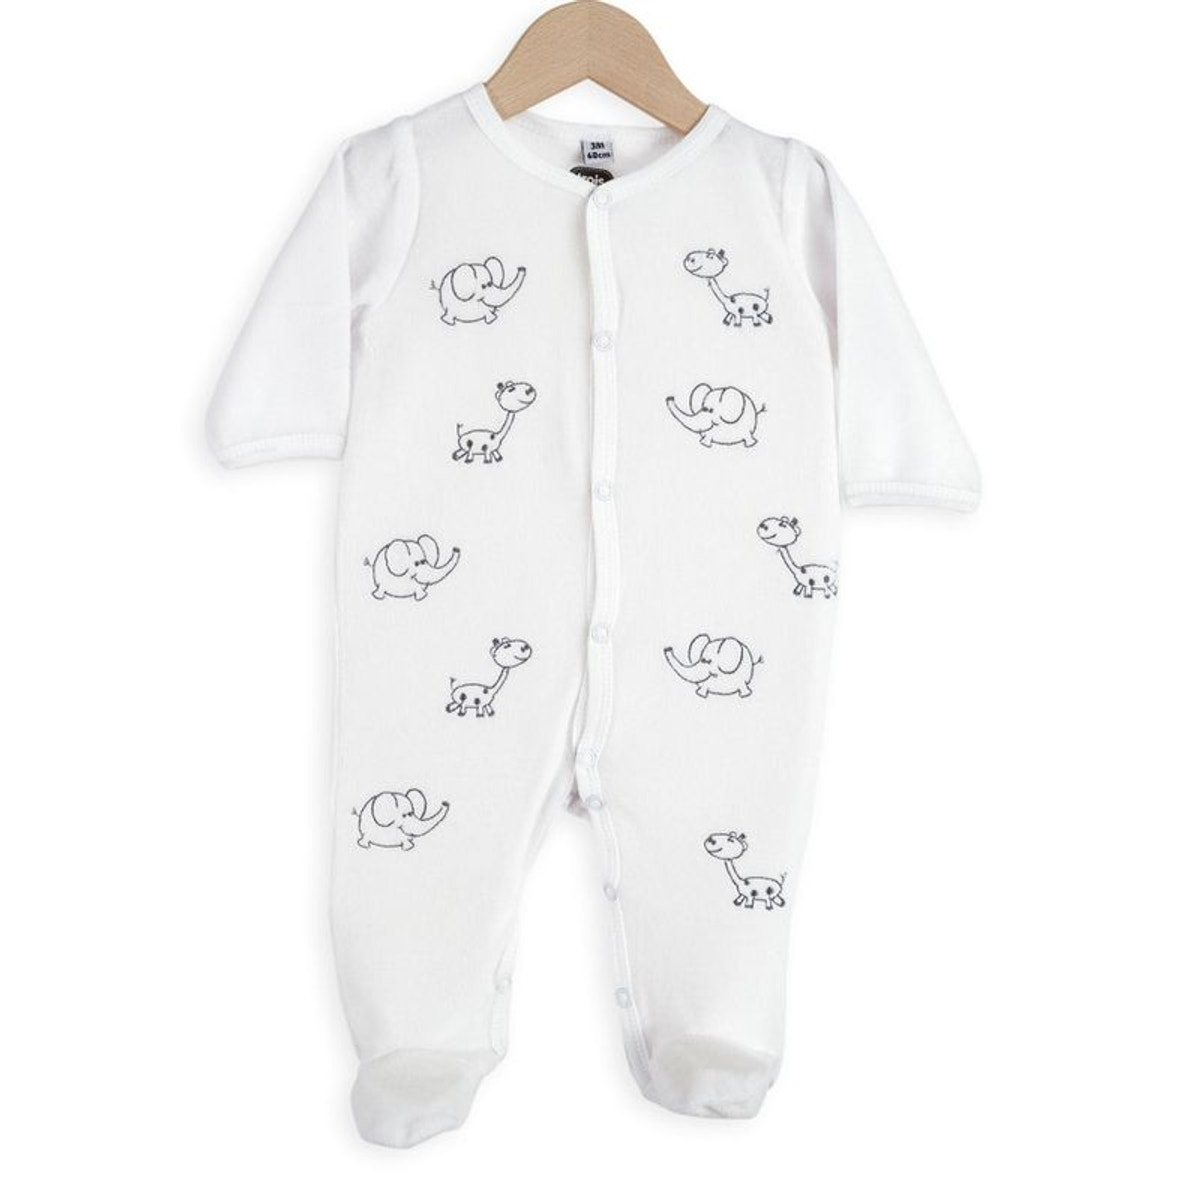 b742b647f1100 Pyjama Bébé - Éléphants Et Girafes - Taille : 0 mois in 2019 ...